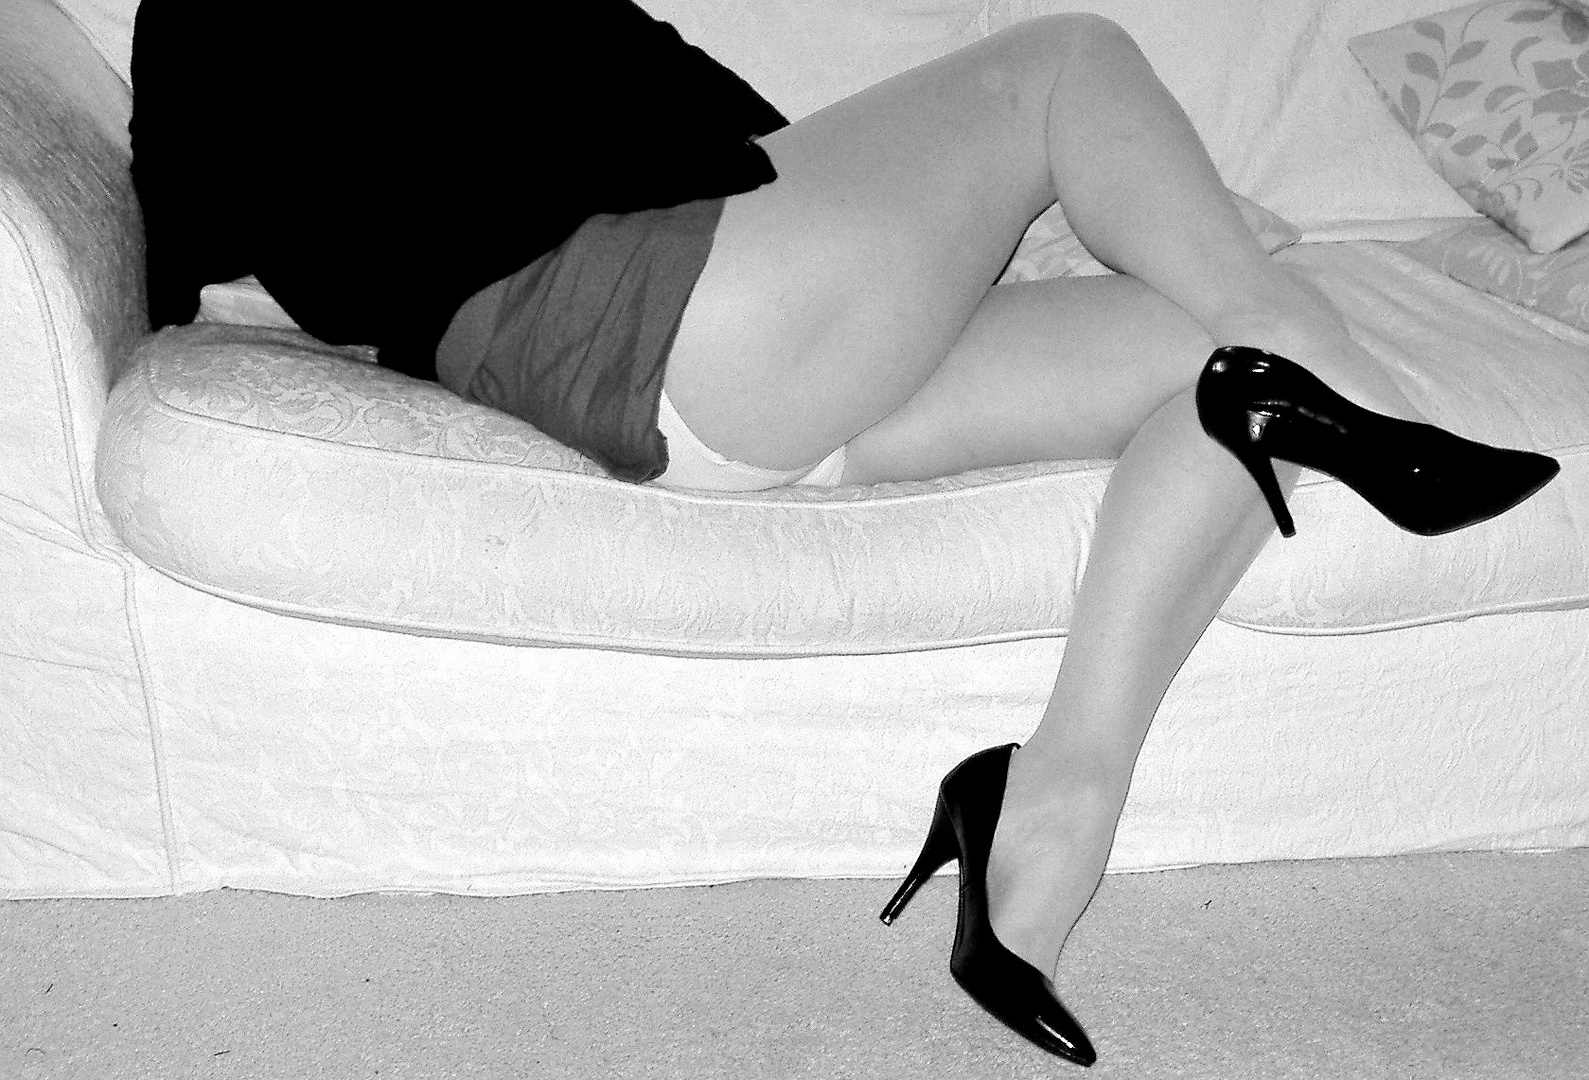 erotische foto posen